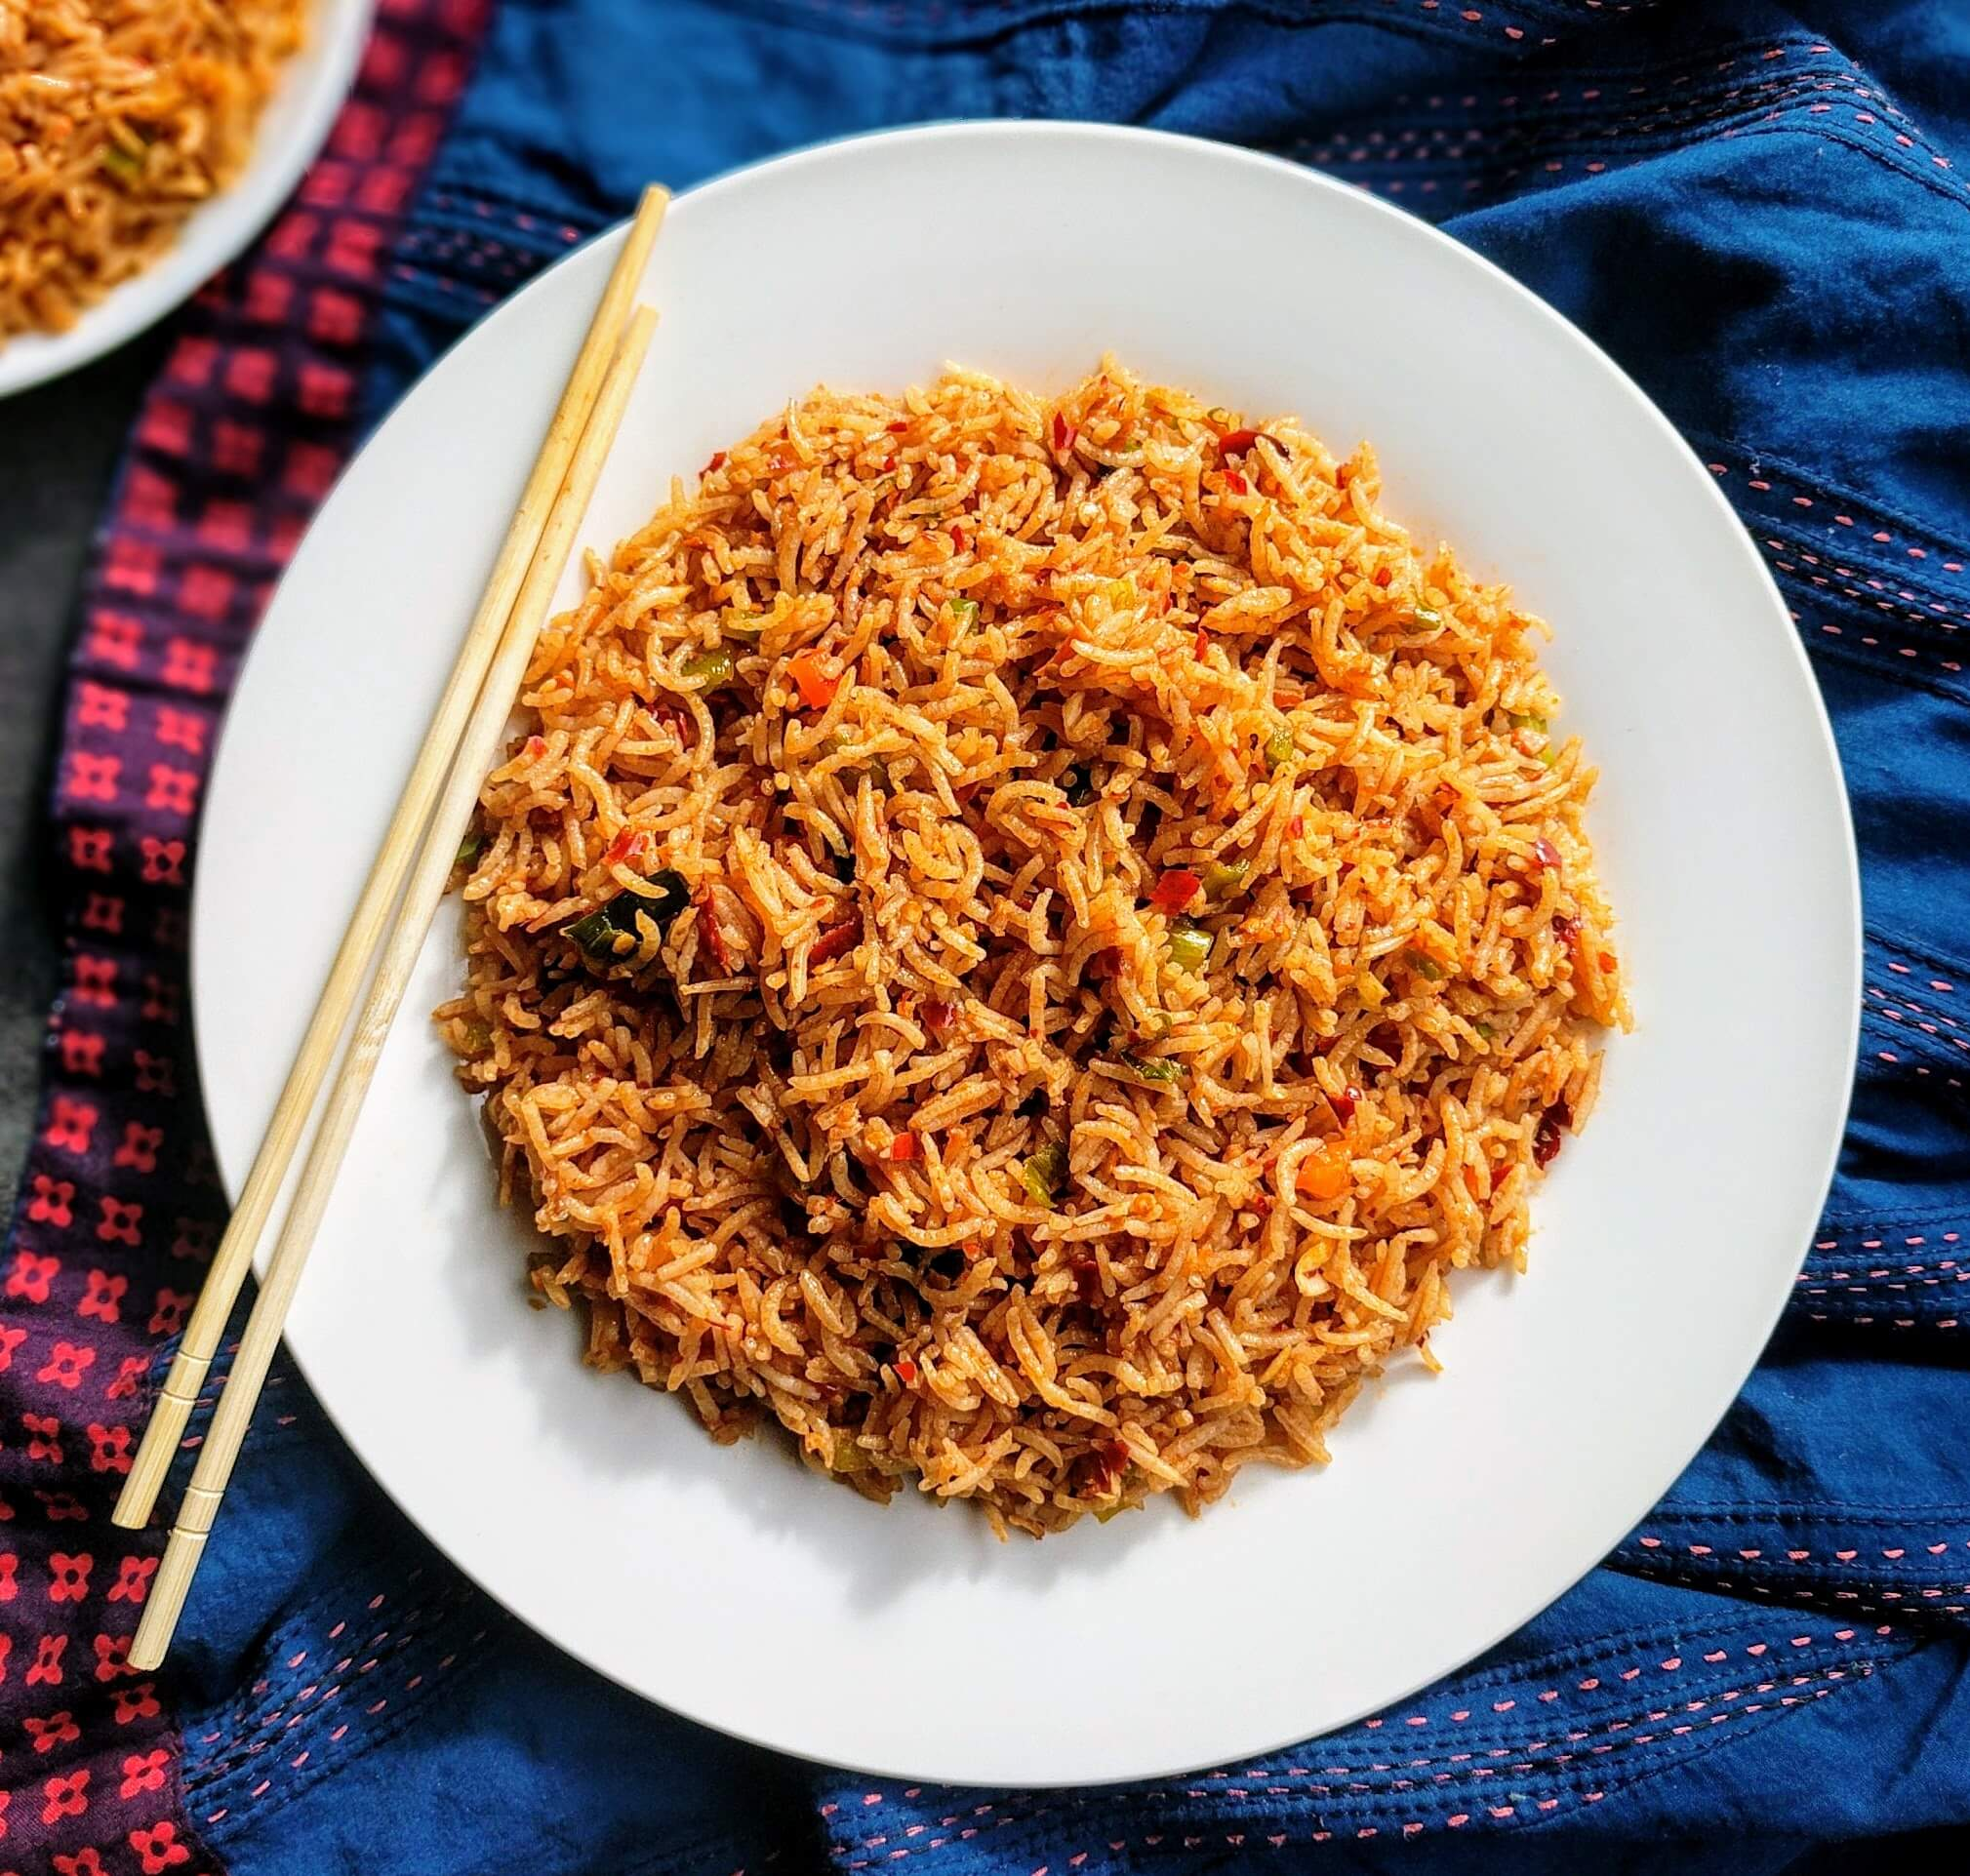 Veg Schezwan Fried Rice Recipe Step By Step Instructions